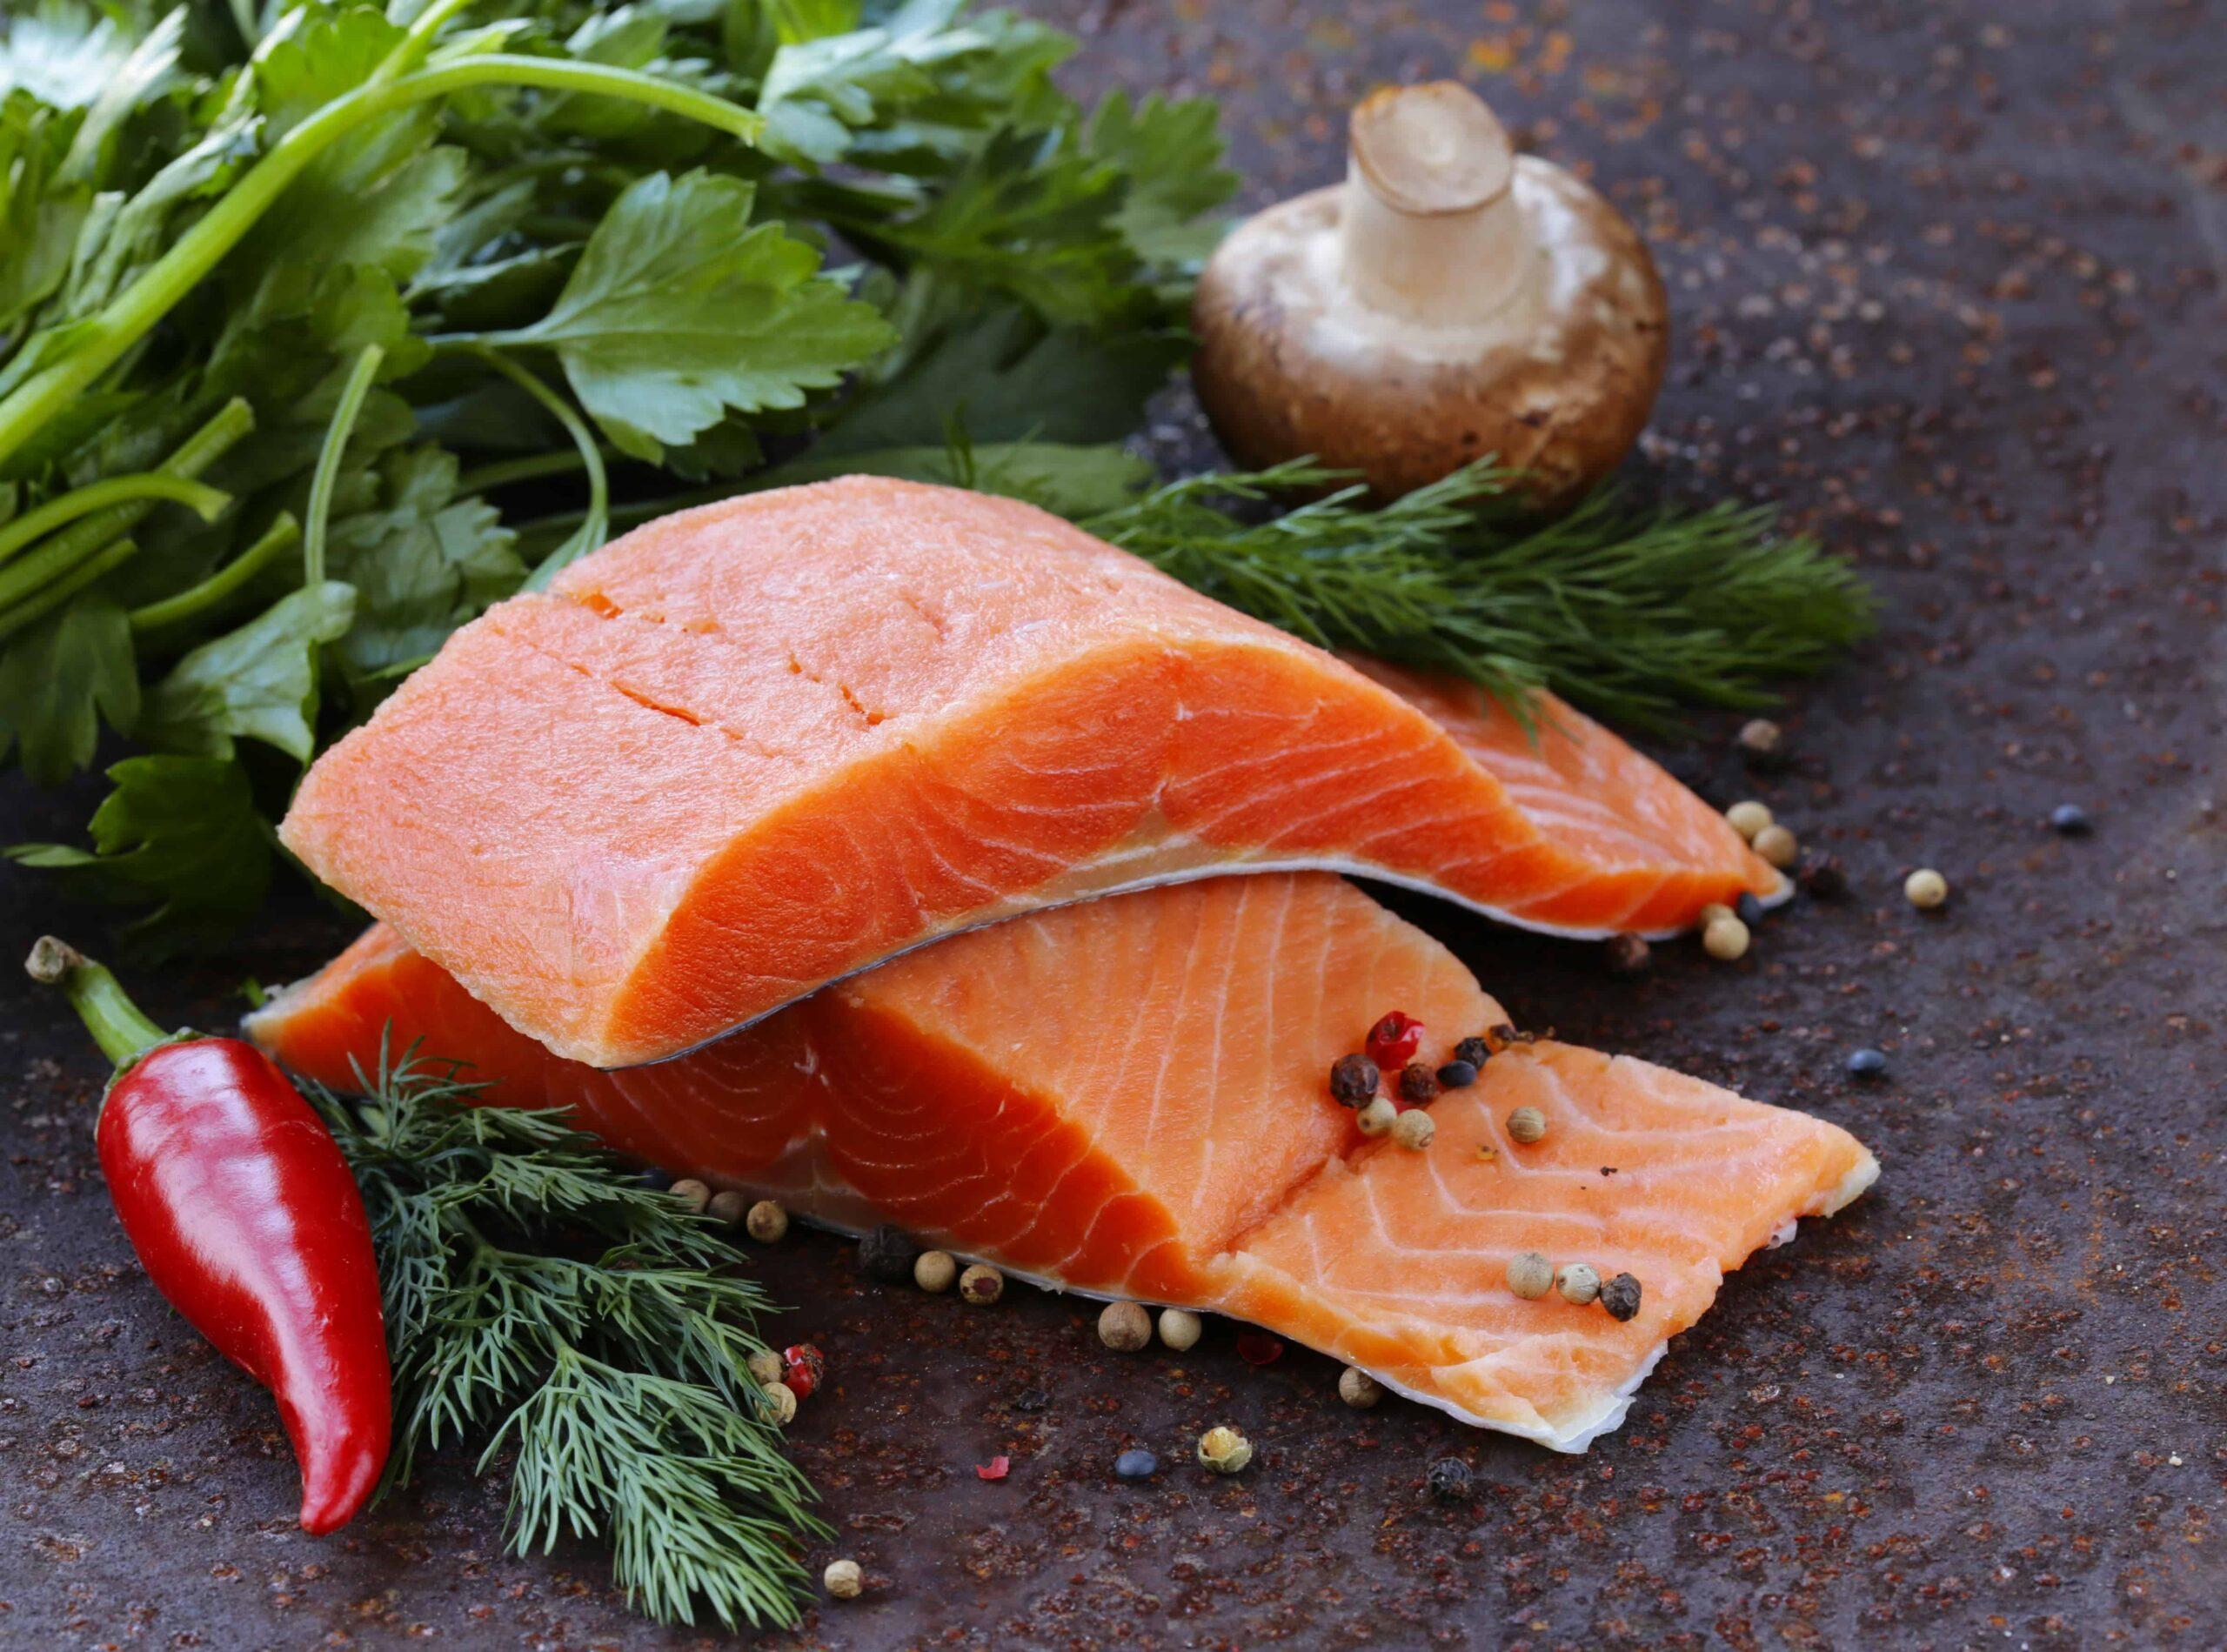 fresh-salmon-red-fish-fillet-2021-04-02-20-49-42-utc-min-6628562